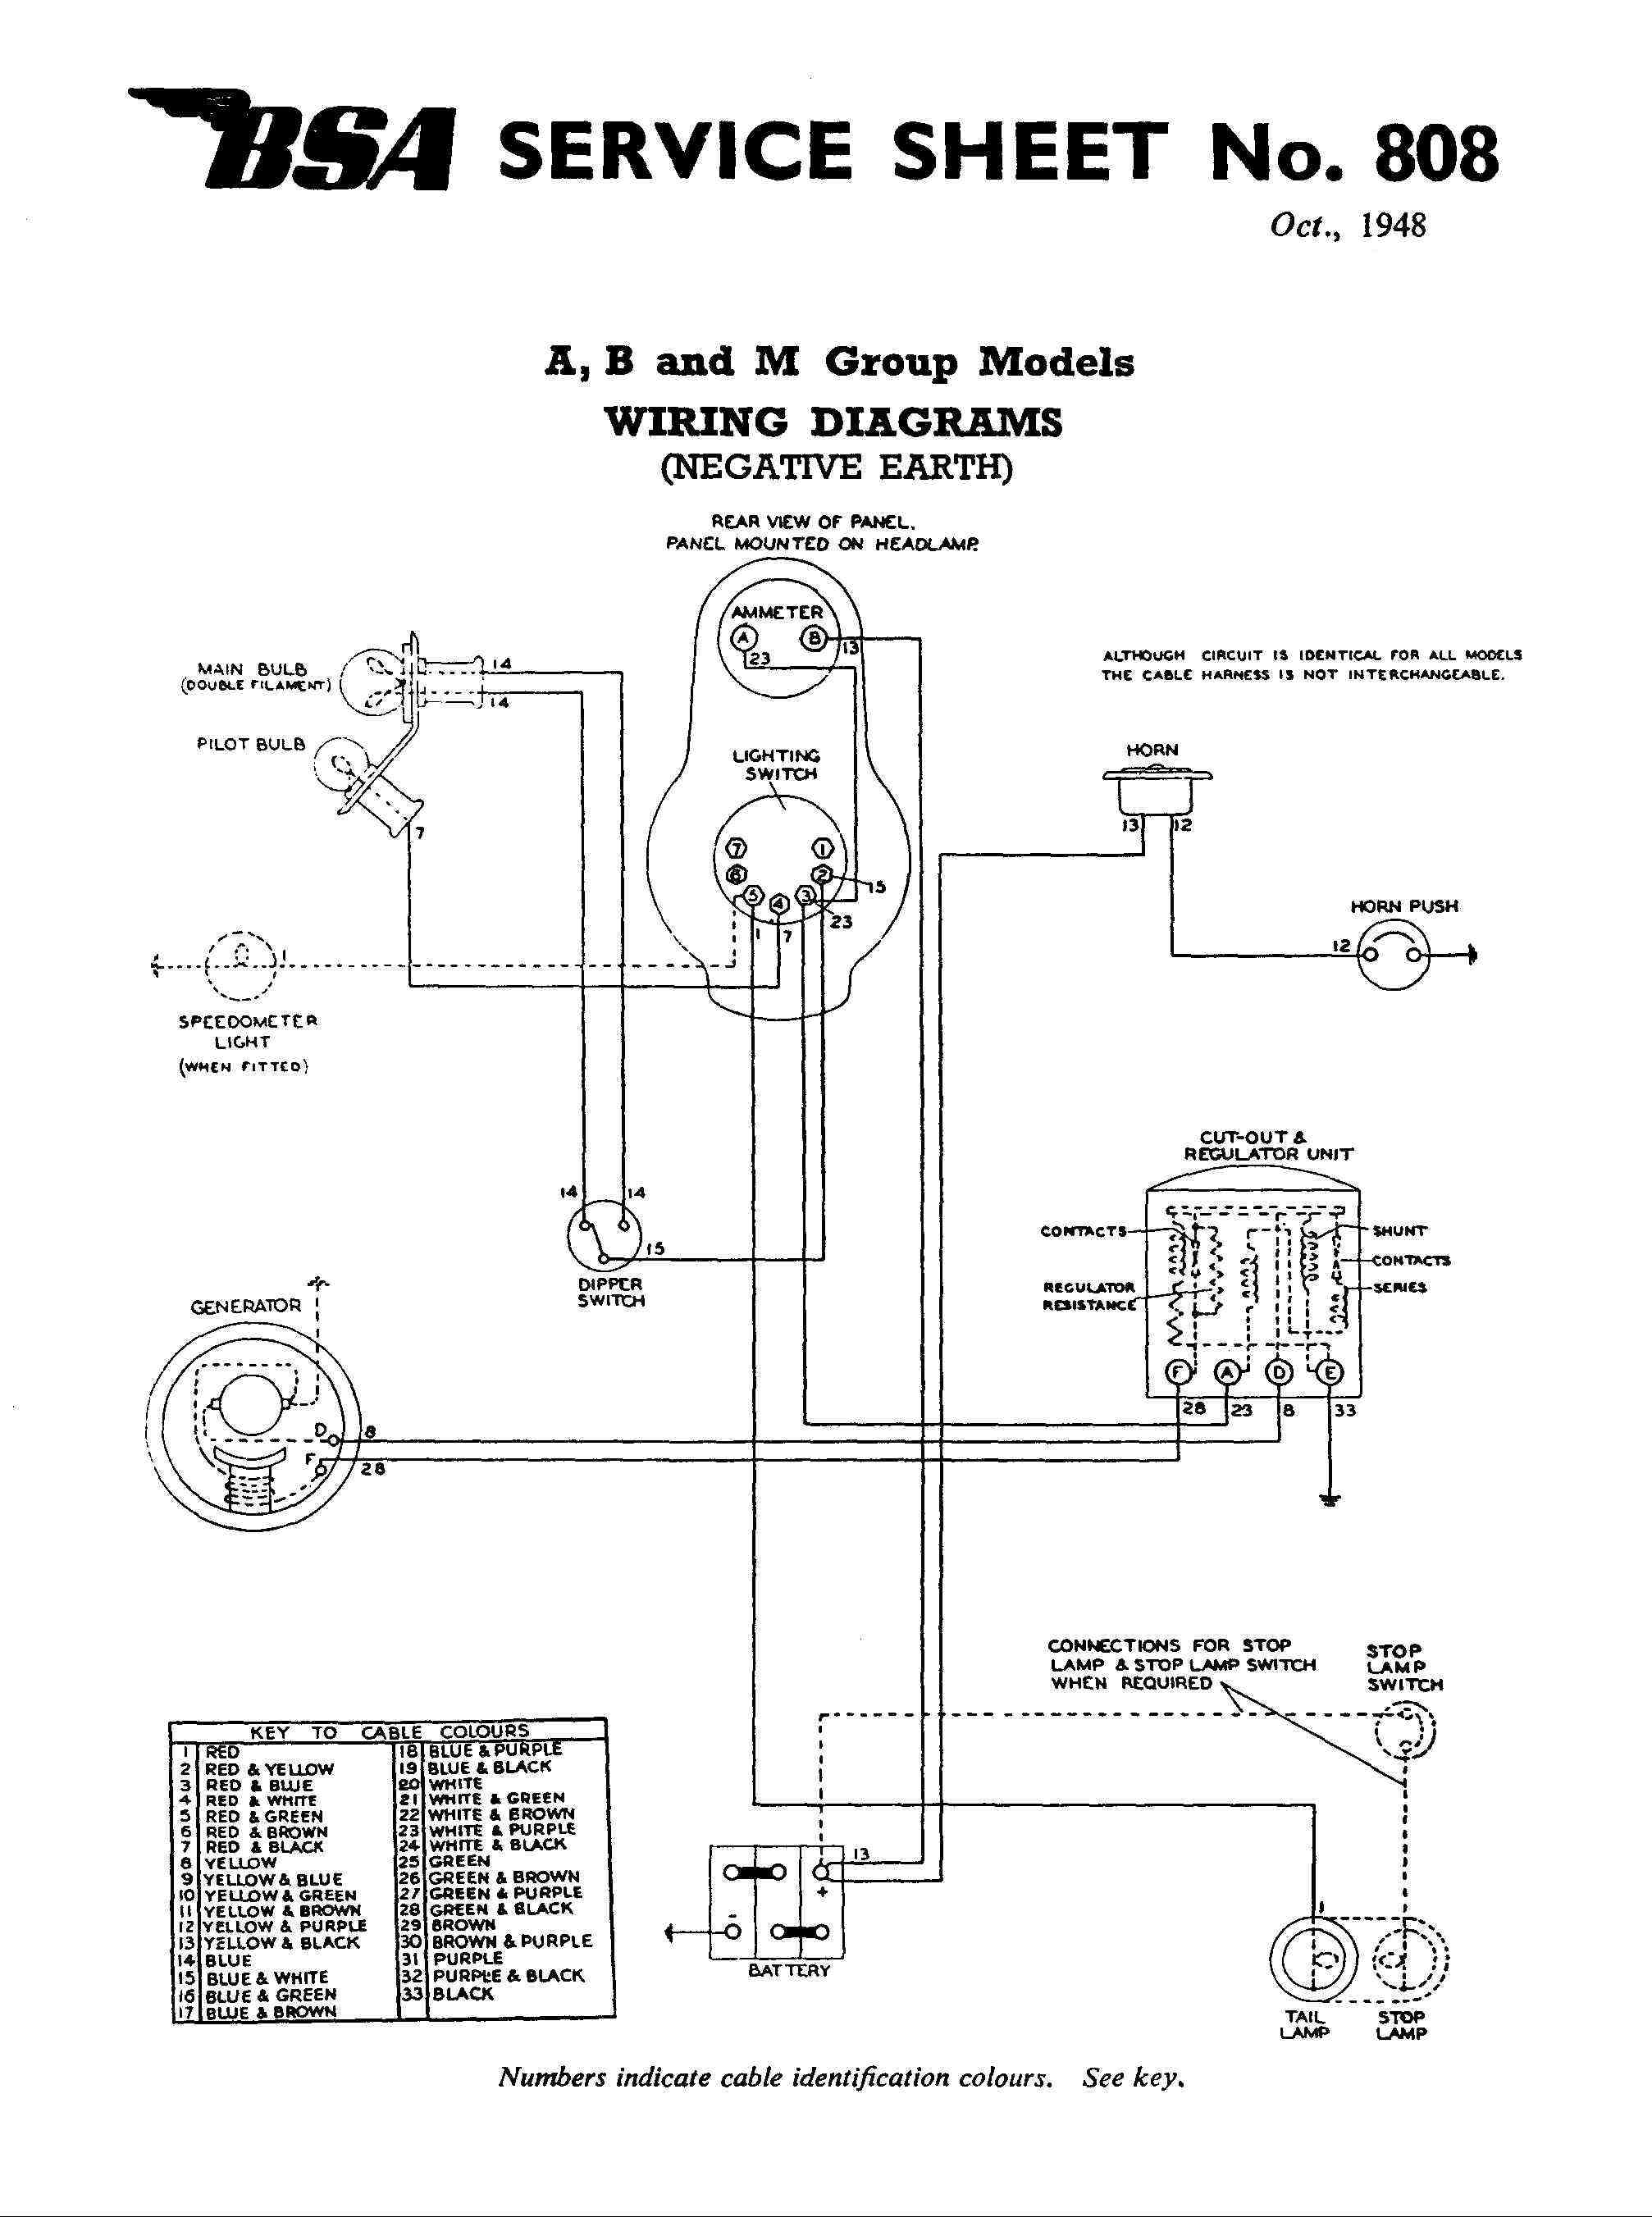 ☑ 1987 Fuel Selector Valve Help Wiring Diagram HD Quality ☑ chen-erd-diagram .altalangaleader.itDiagram Database